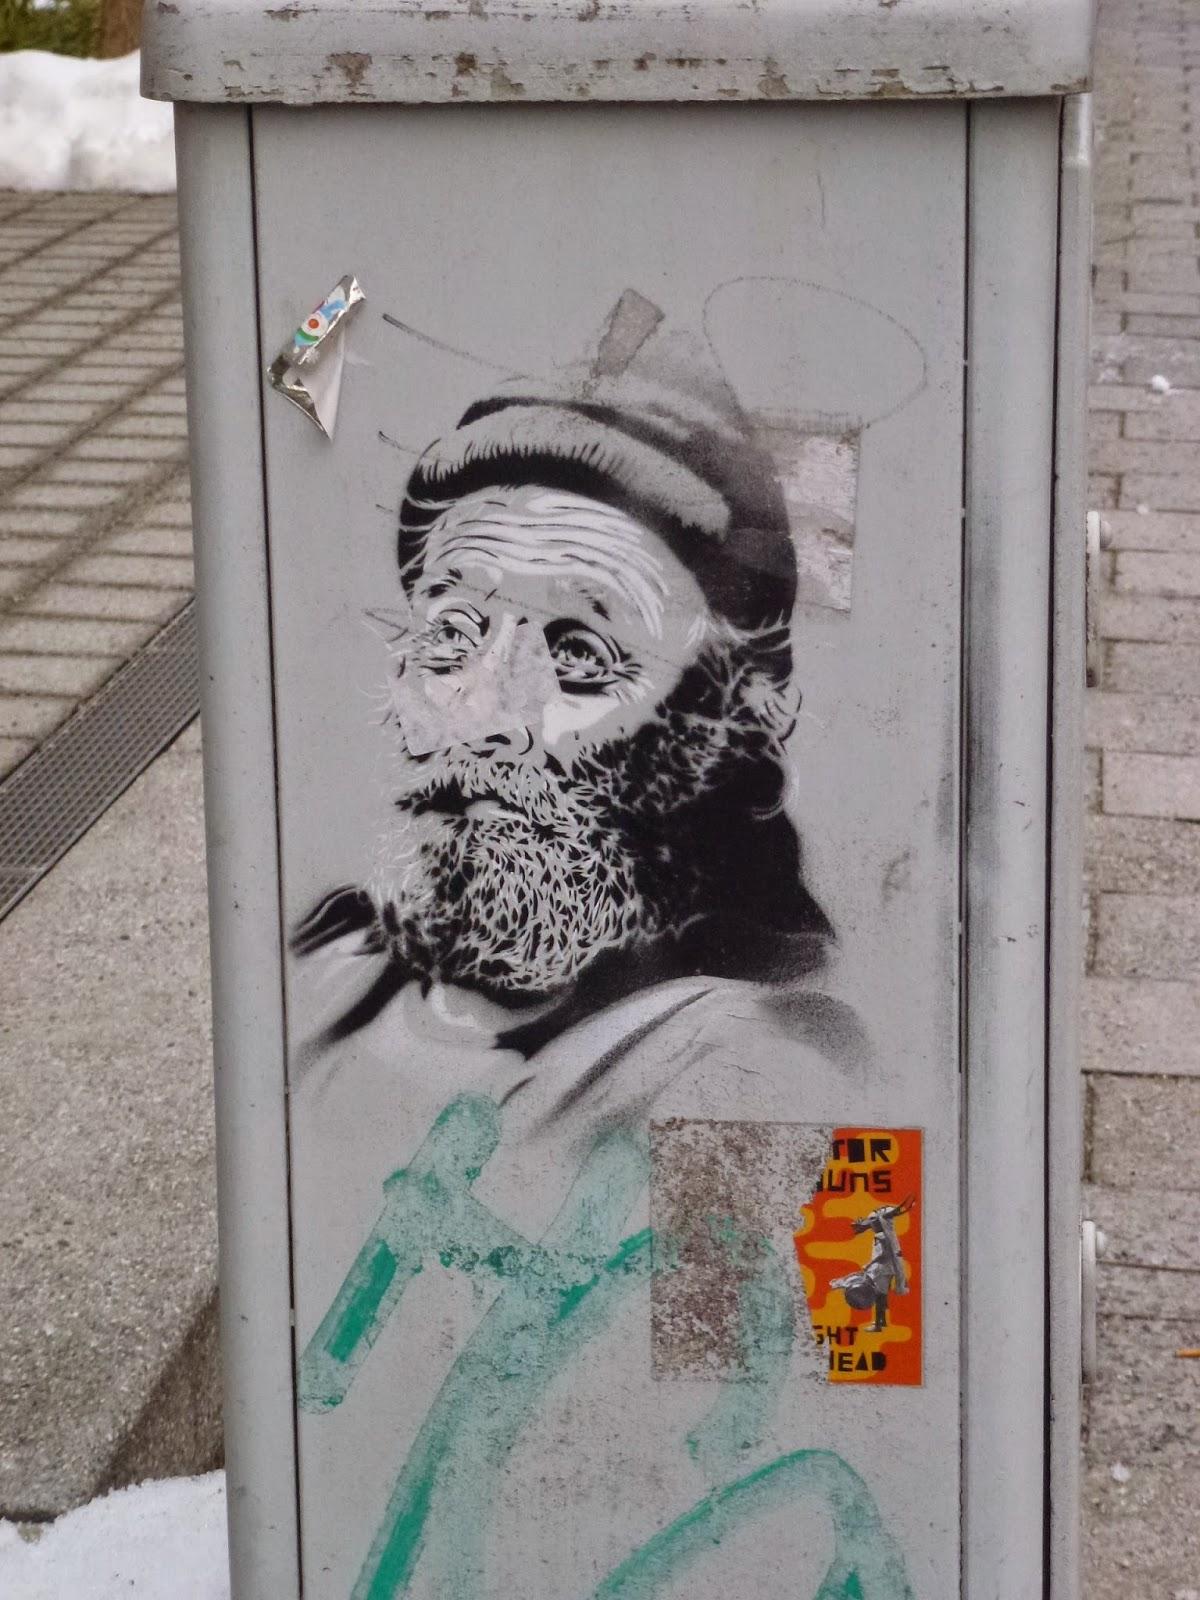 Streetart, Urbanart, Graffiti, Stencil, Schablonen